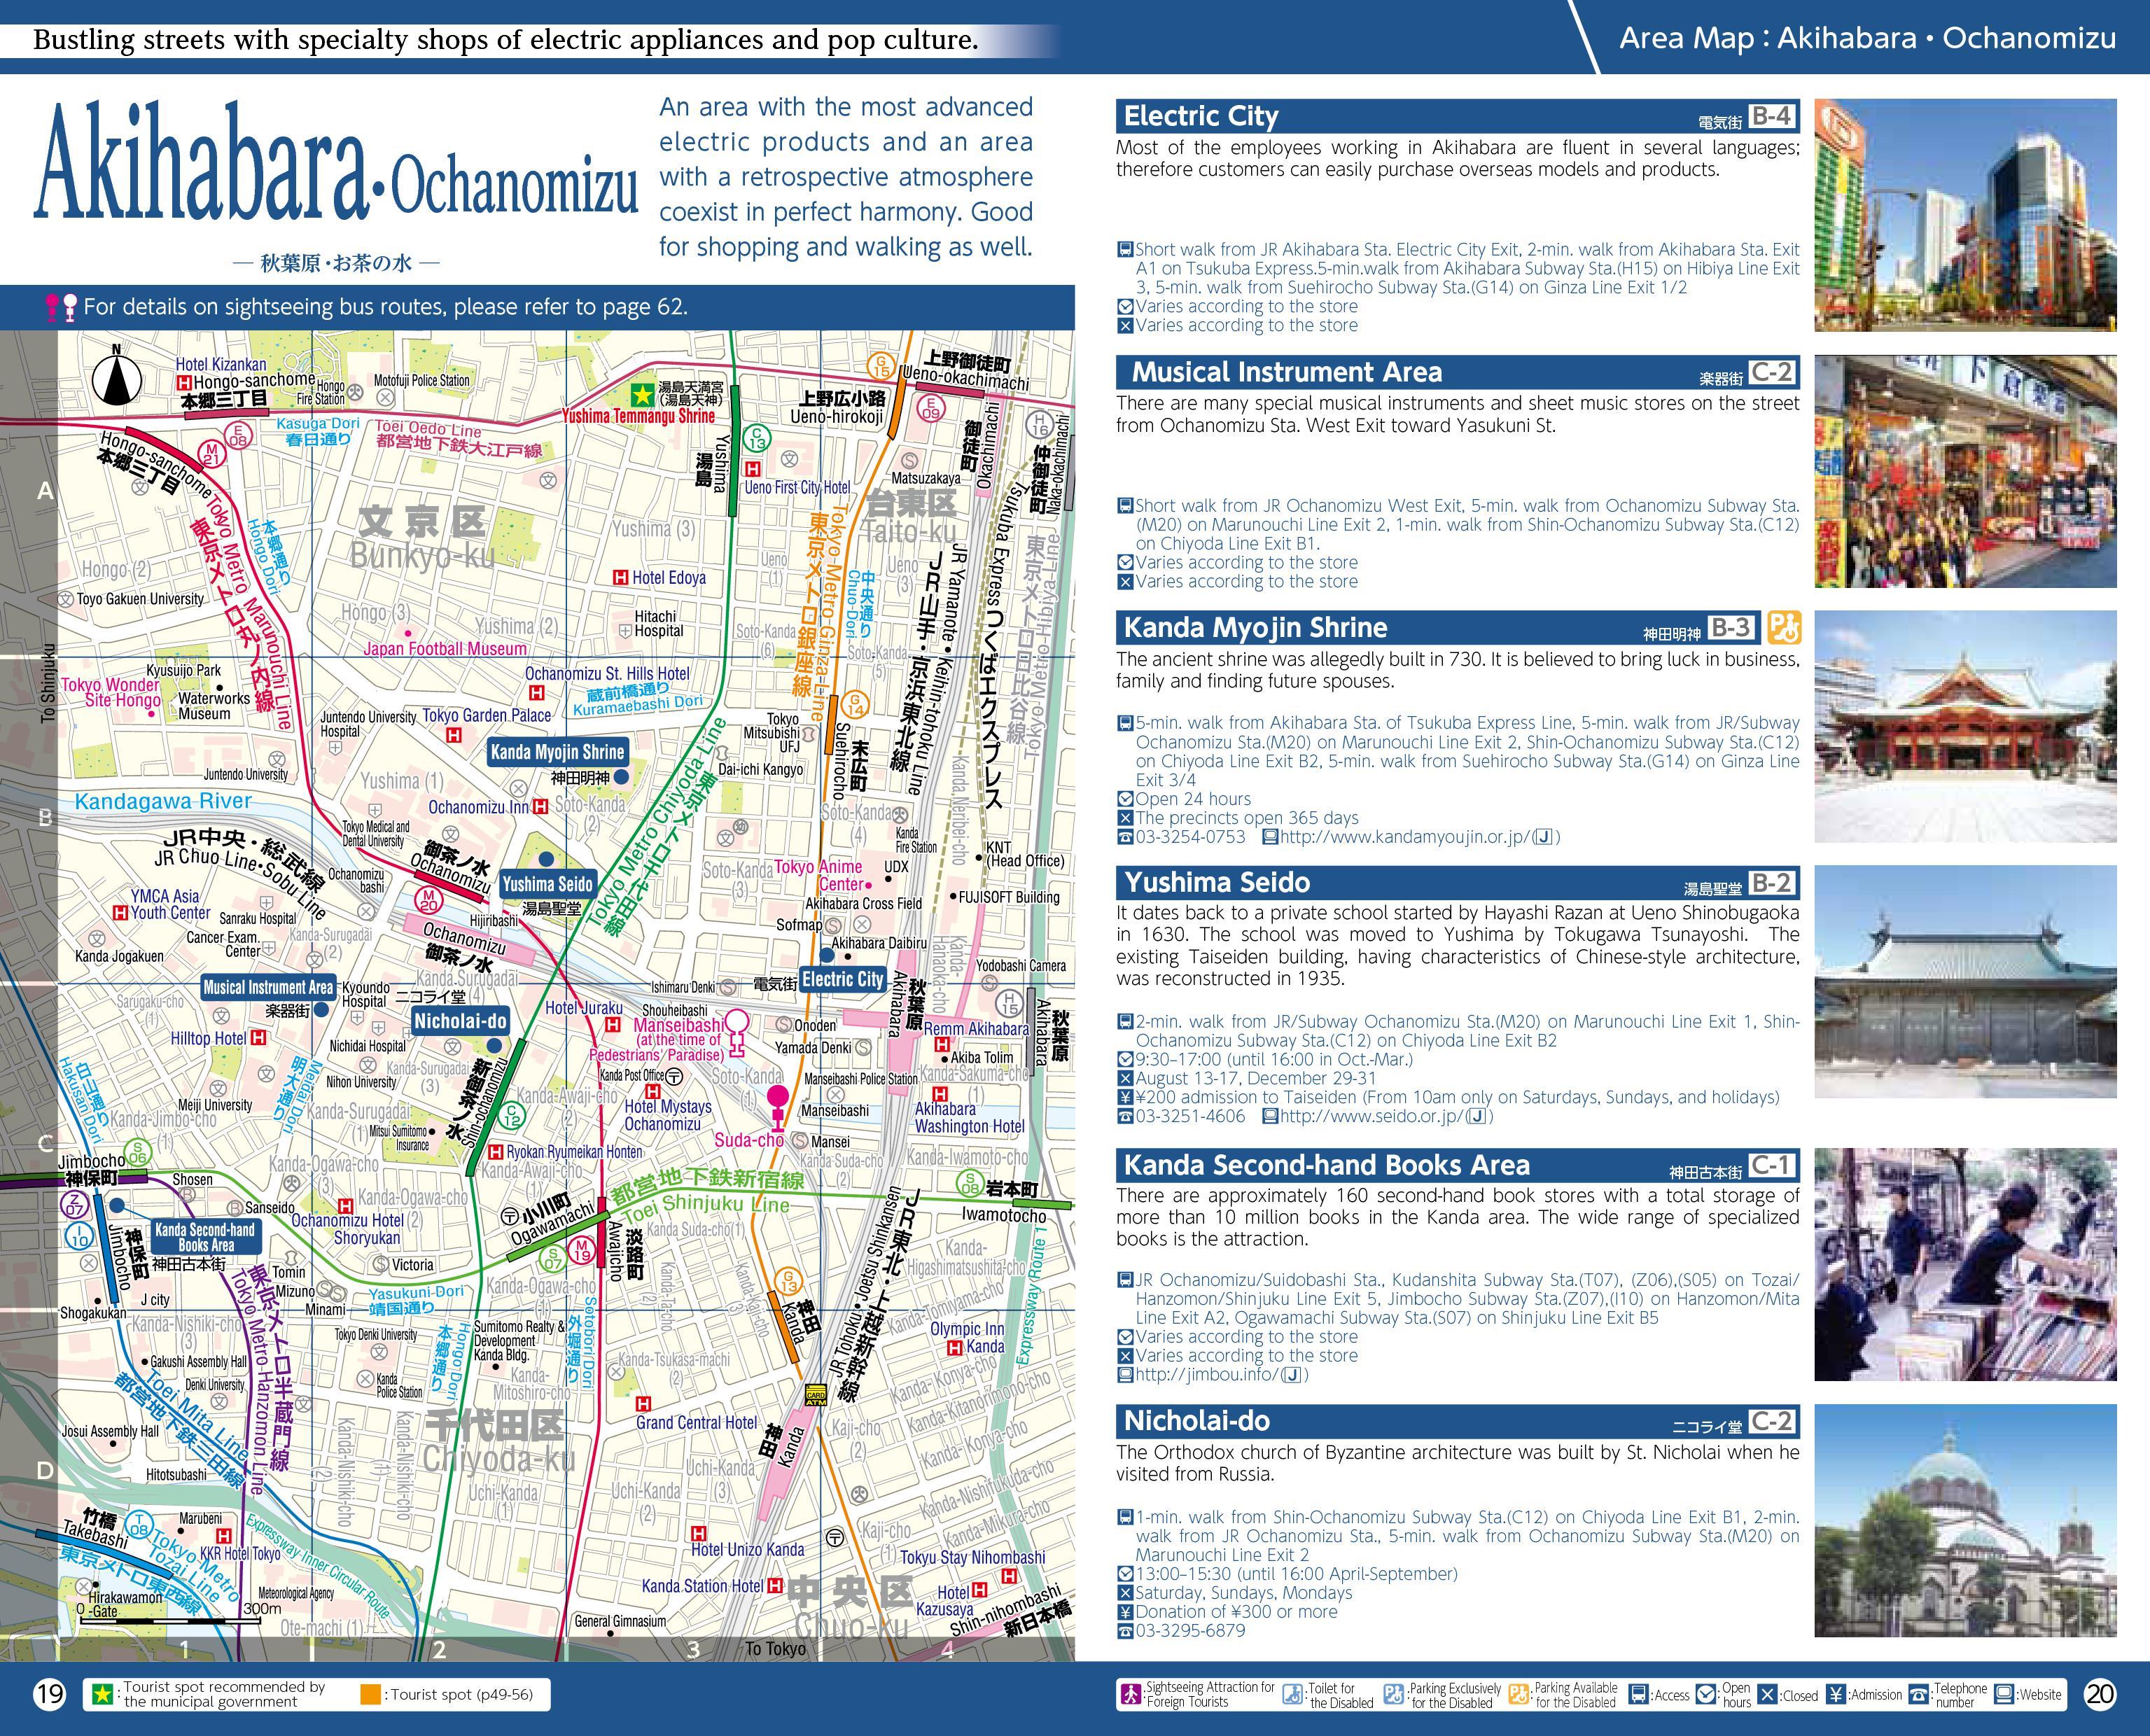 Akihabara Ochanomizu map